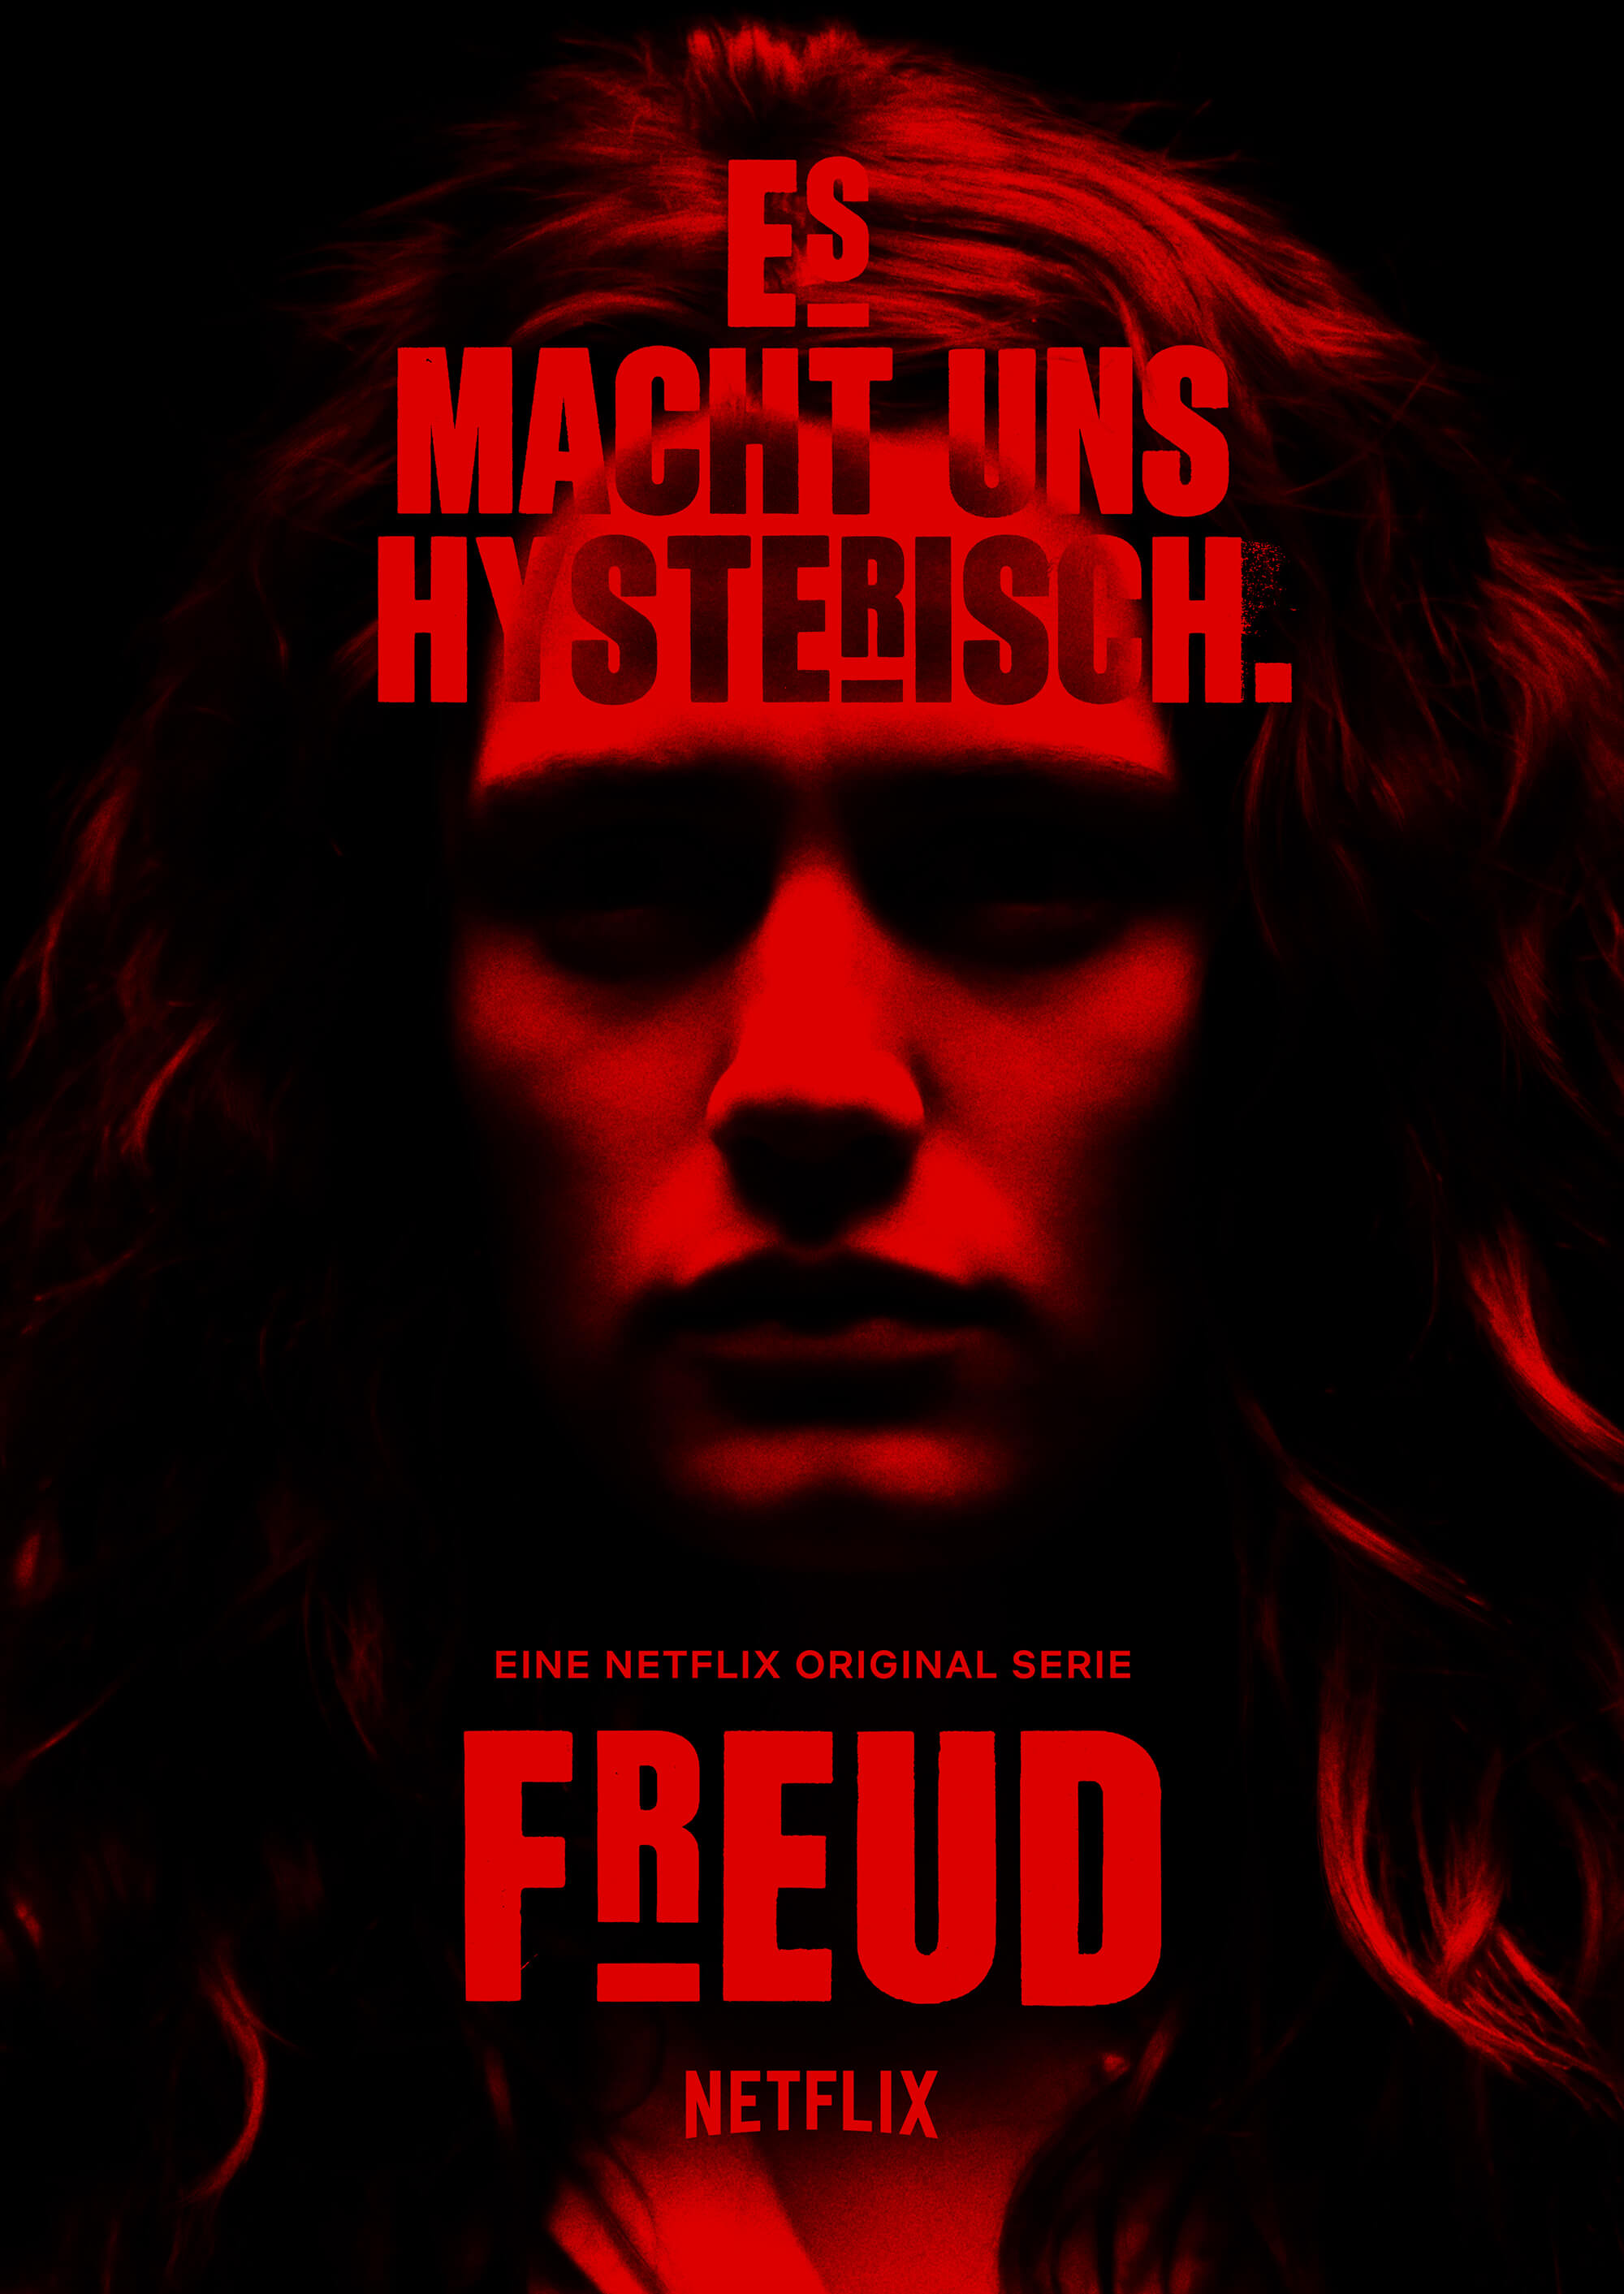 8490_FREUD_Characters_Freud_Dark_SmallSized_Headline_Fleur